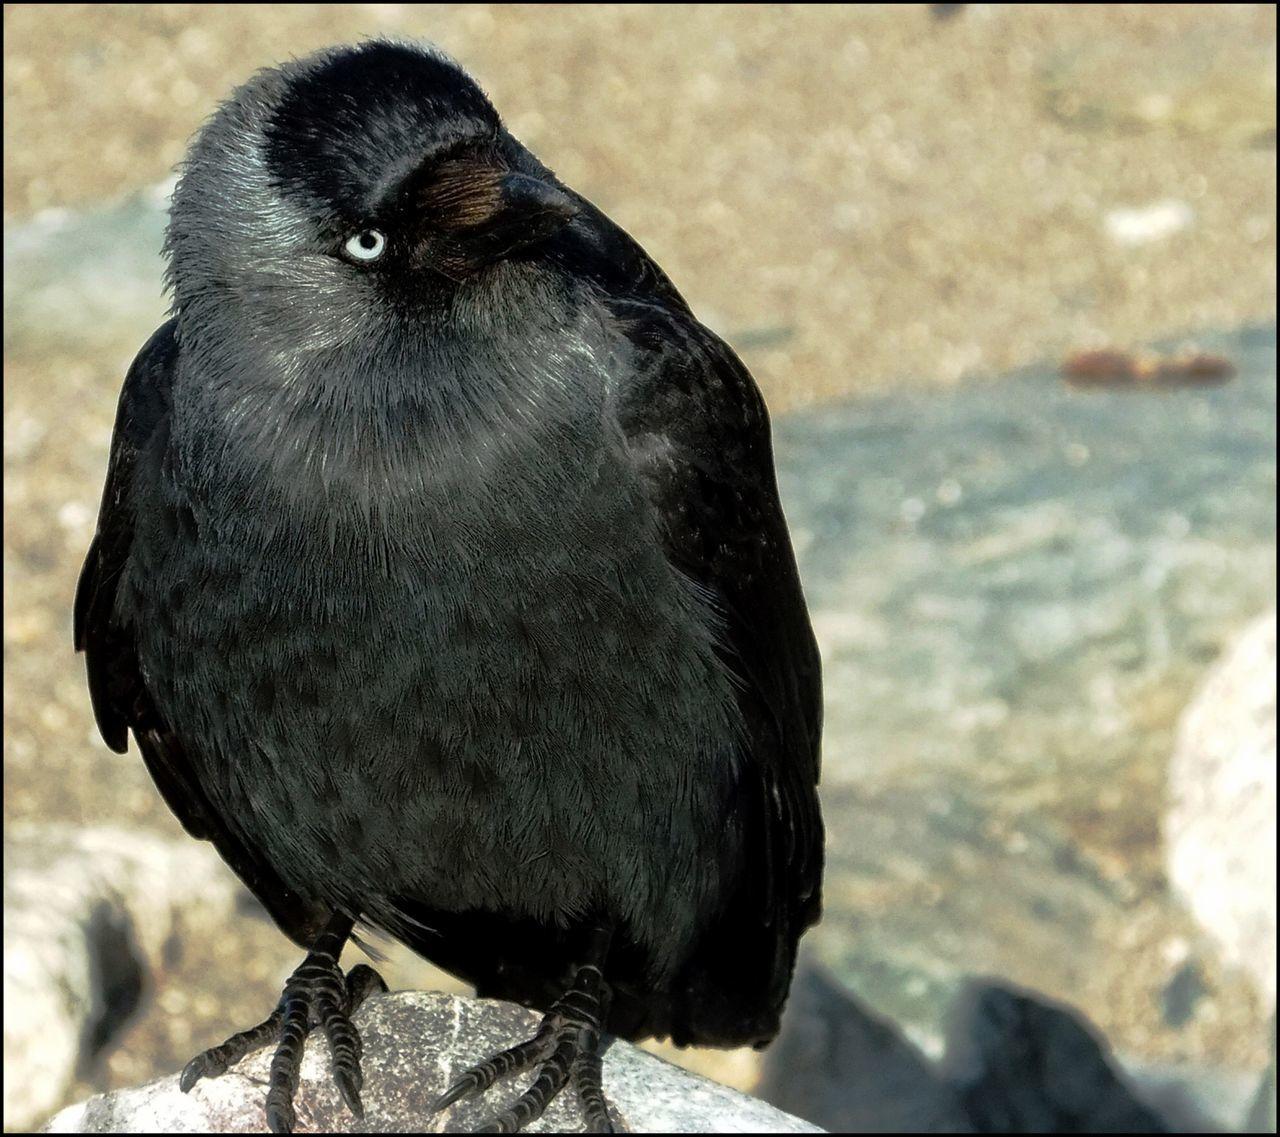 bird, one animal, animal themes, animals in the wild, close-up, animal wildlife, focus on foreground, day, no people, nature, beak, outdoors, raven - bird, perching